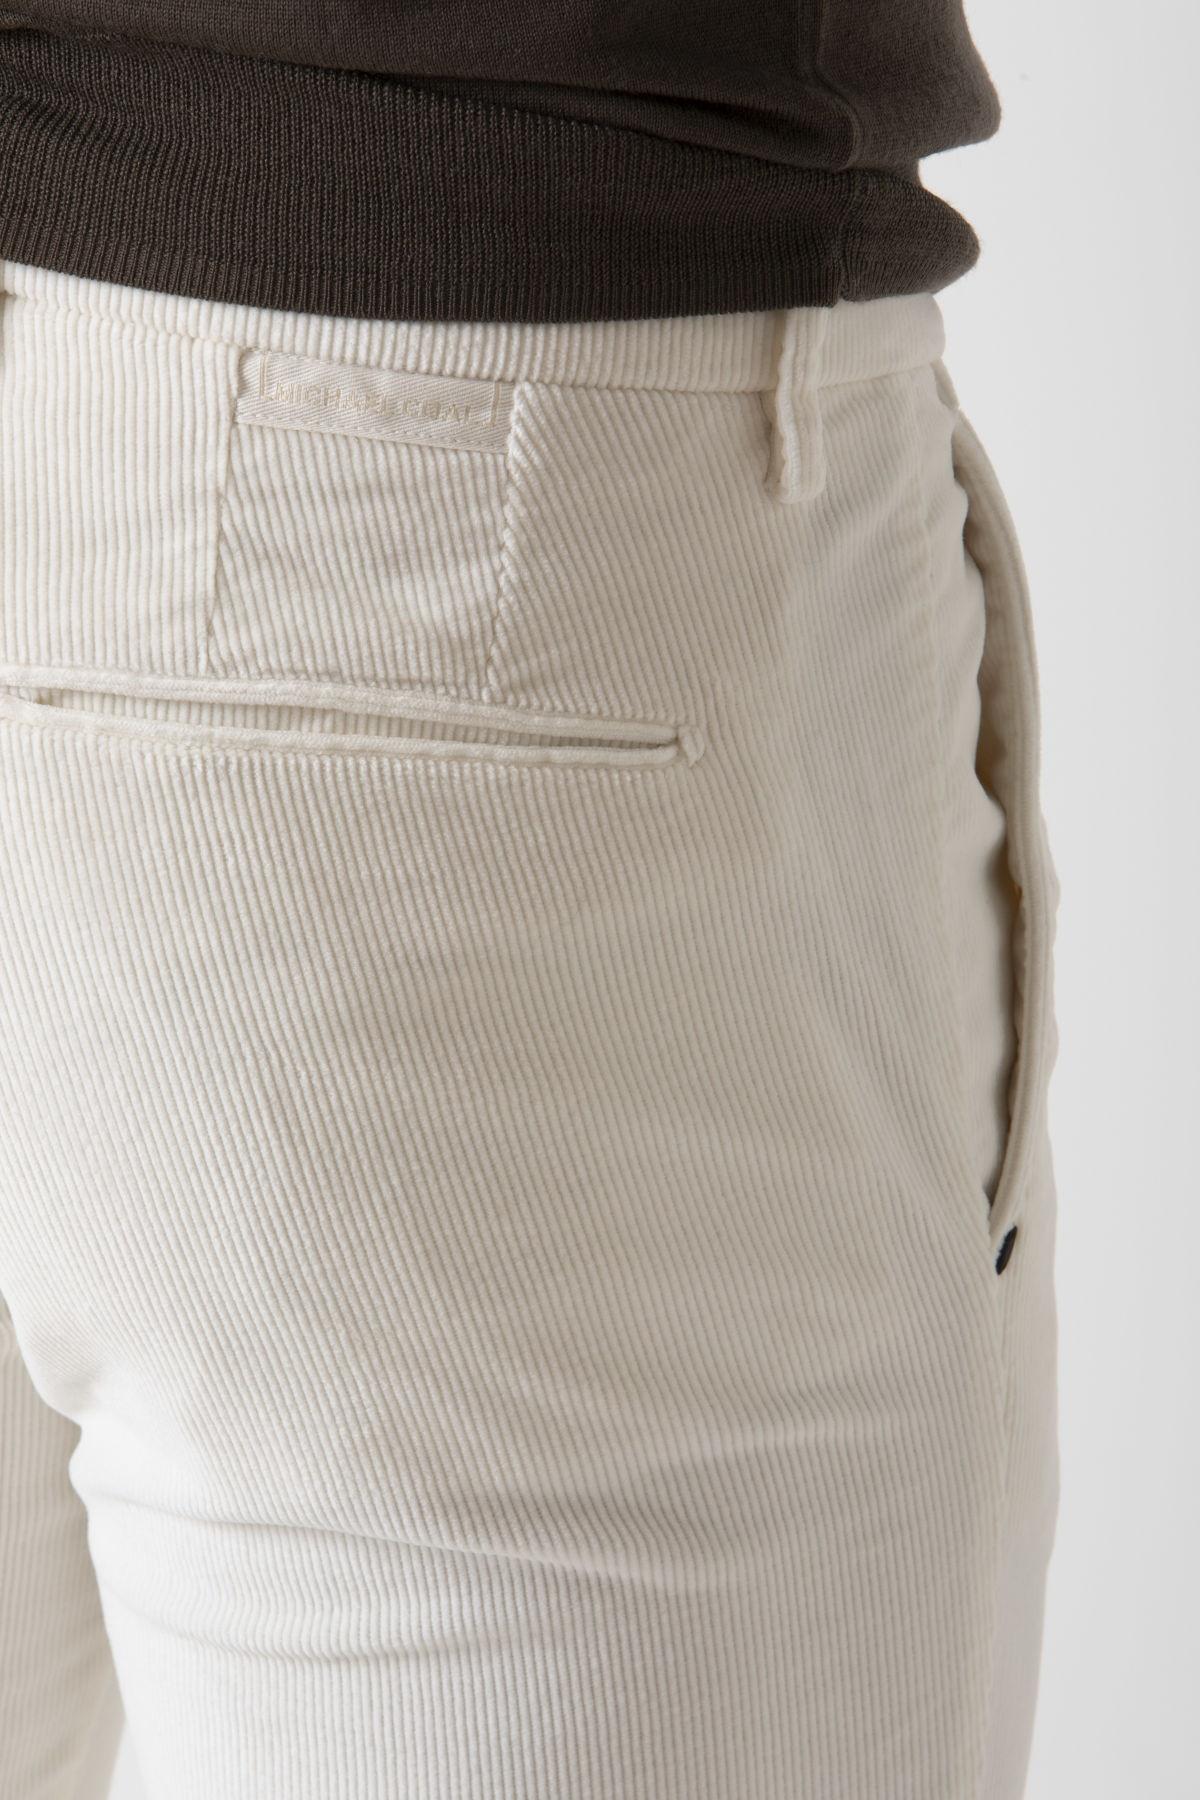 BRAD Trousers for man MICHAEL COAL F/W 19-20